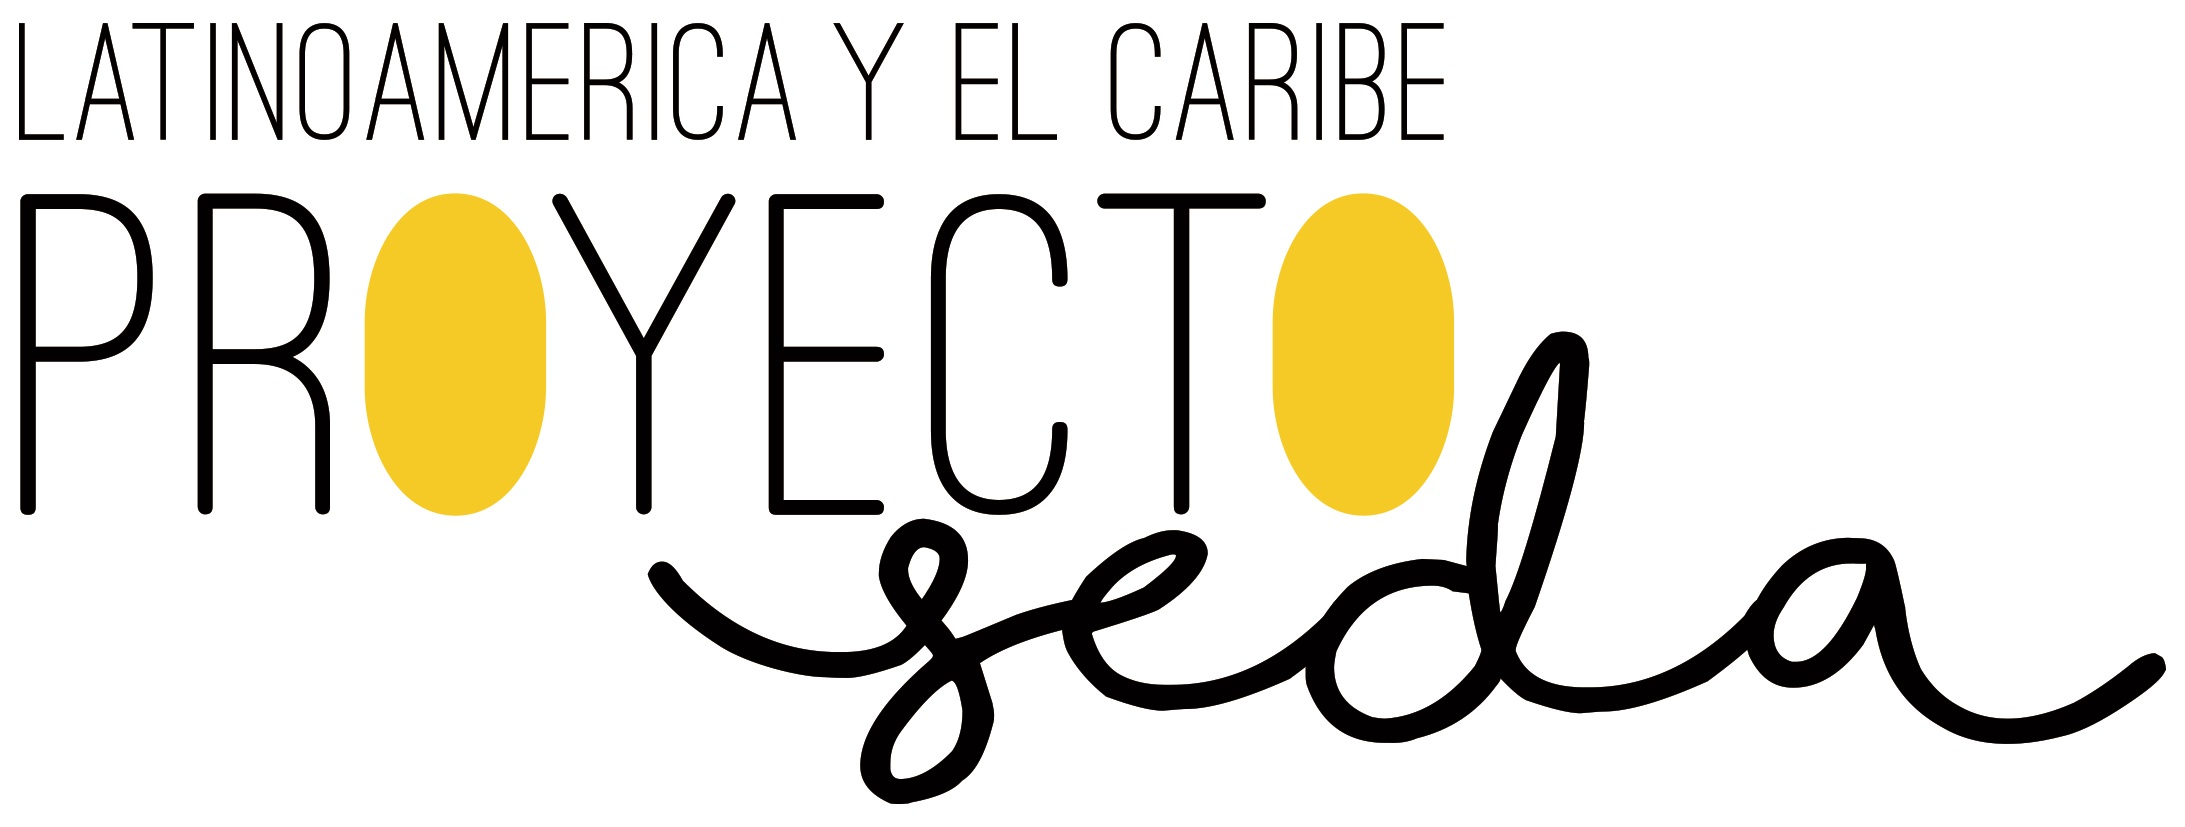 Logo Proyecto Seda in Latino America